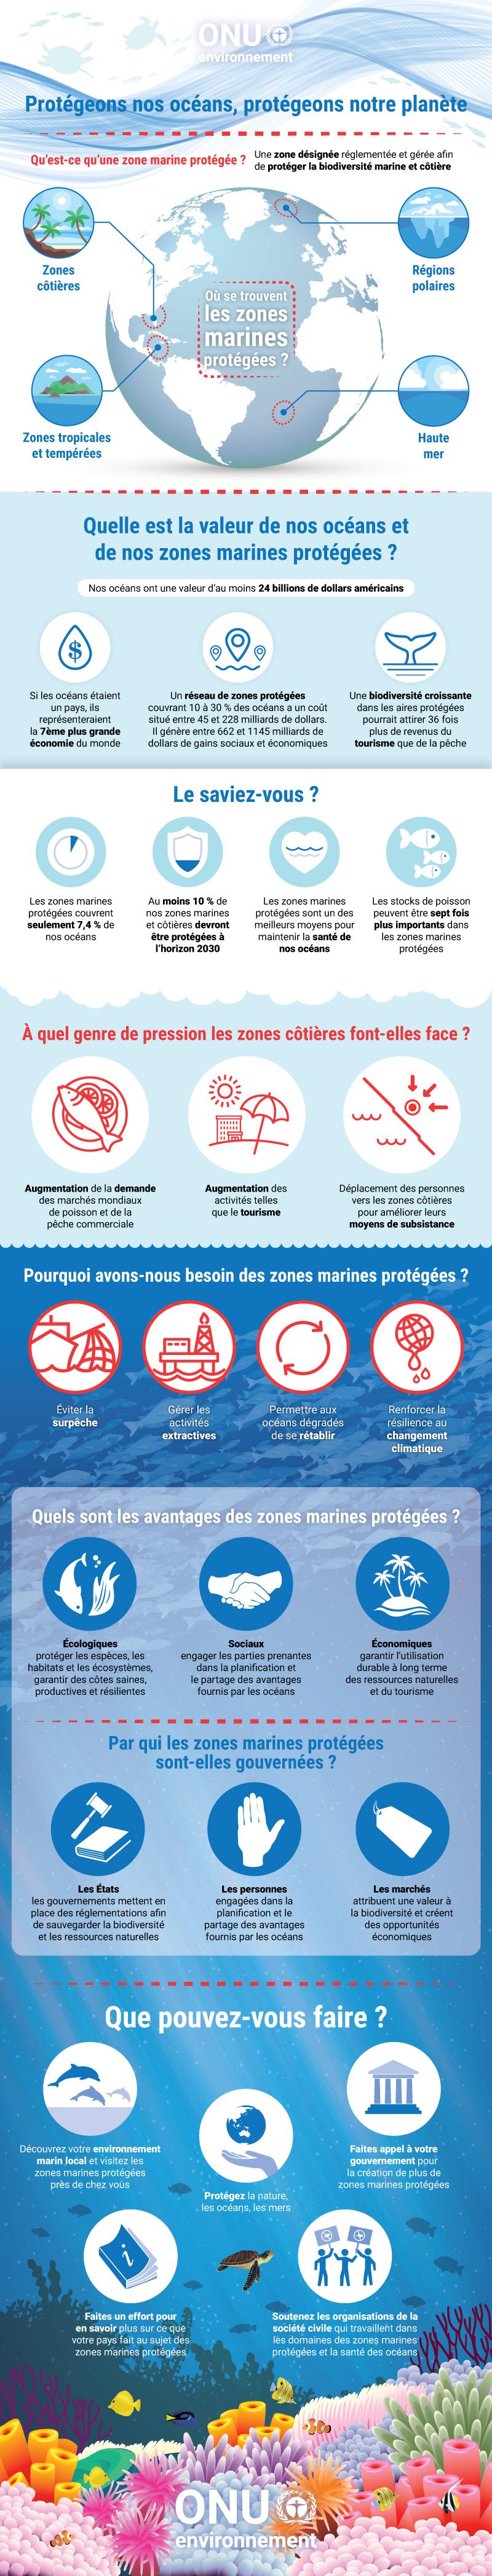 FR_MPAs_infographic.jpg